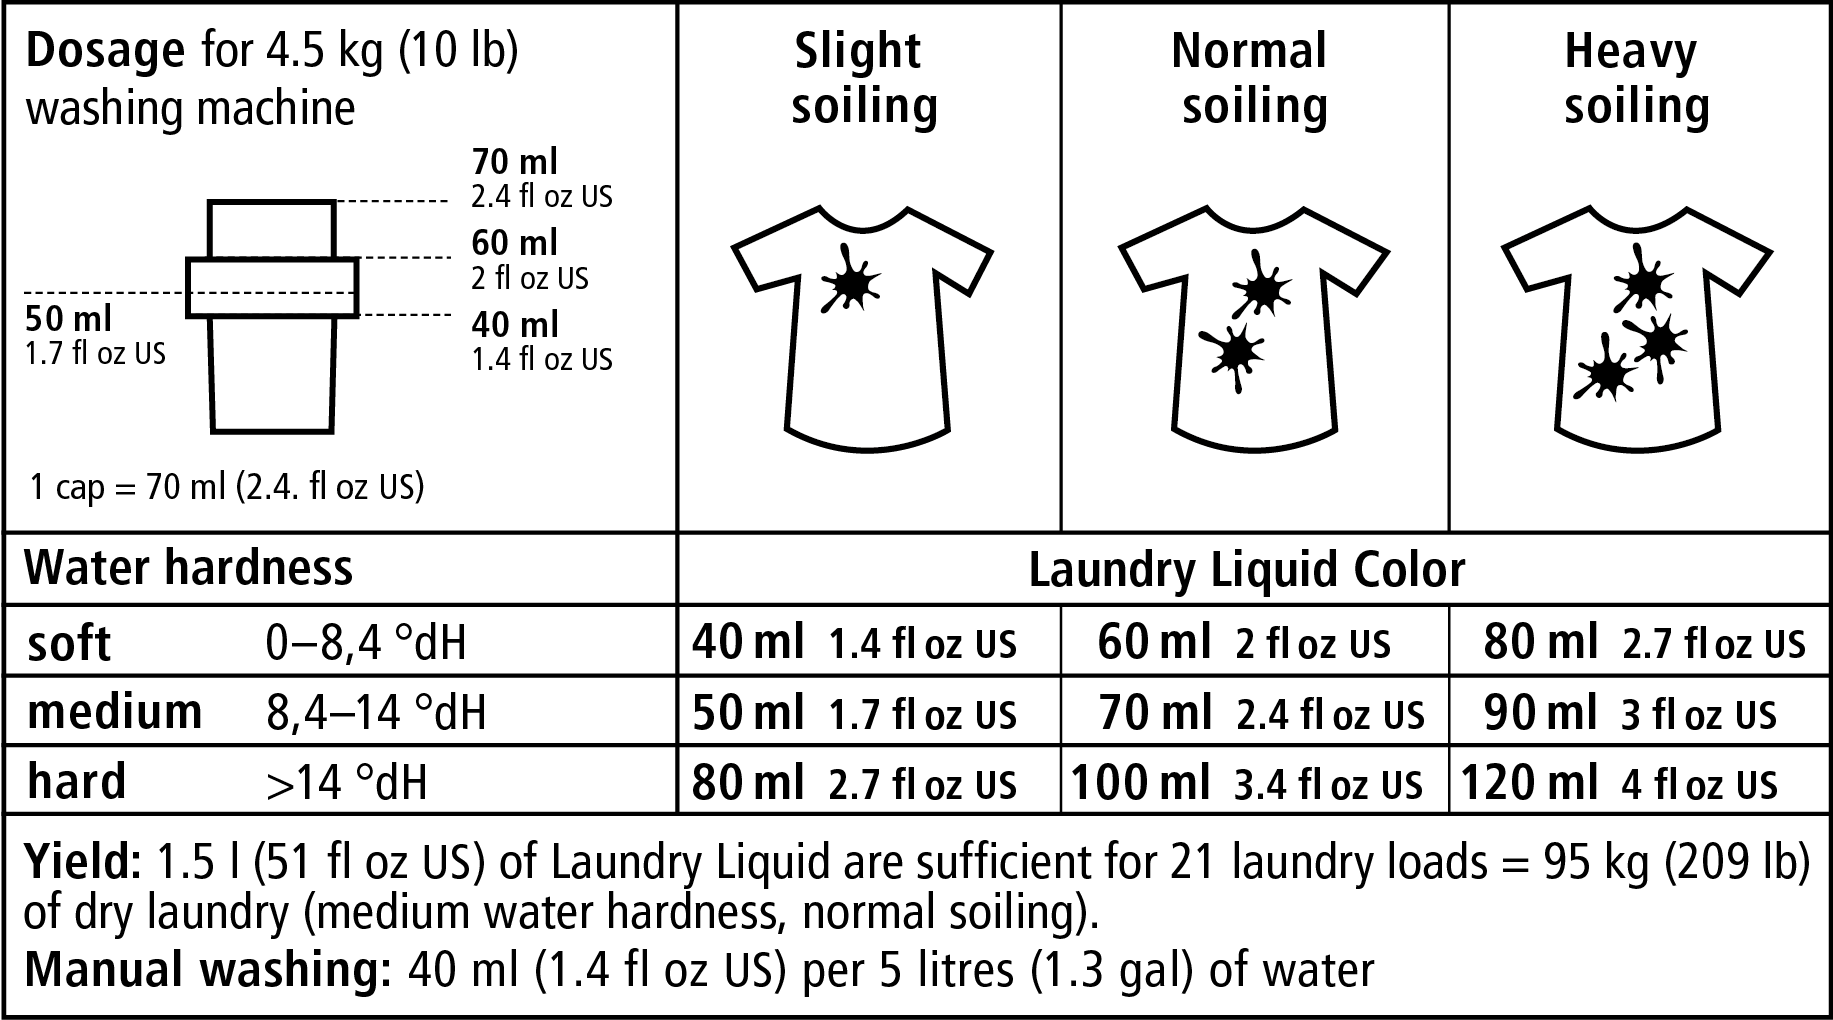 sonett_dosage_laundry_liquid_color.png